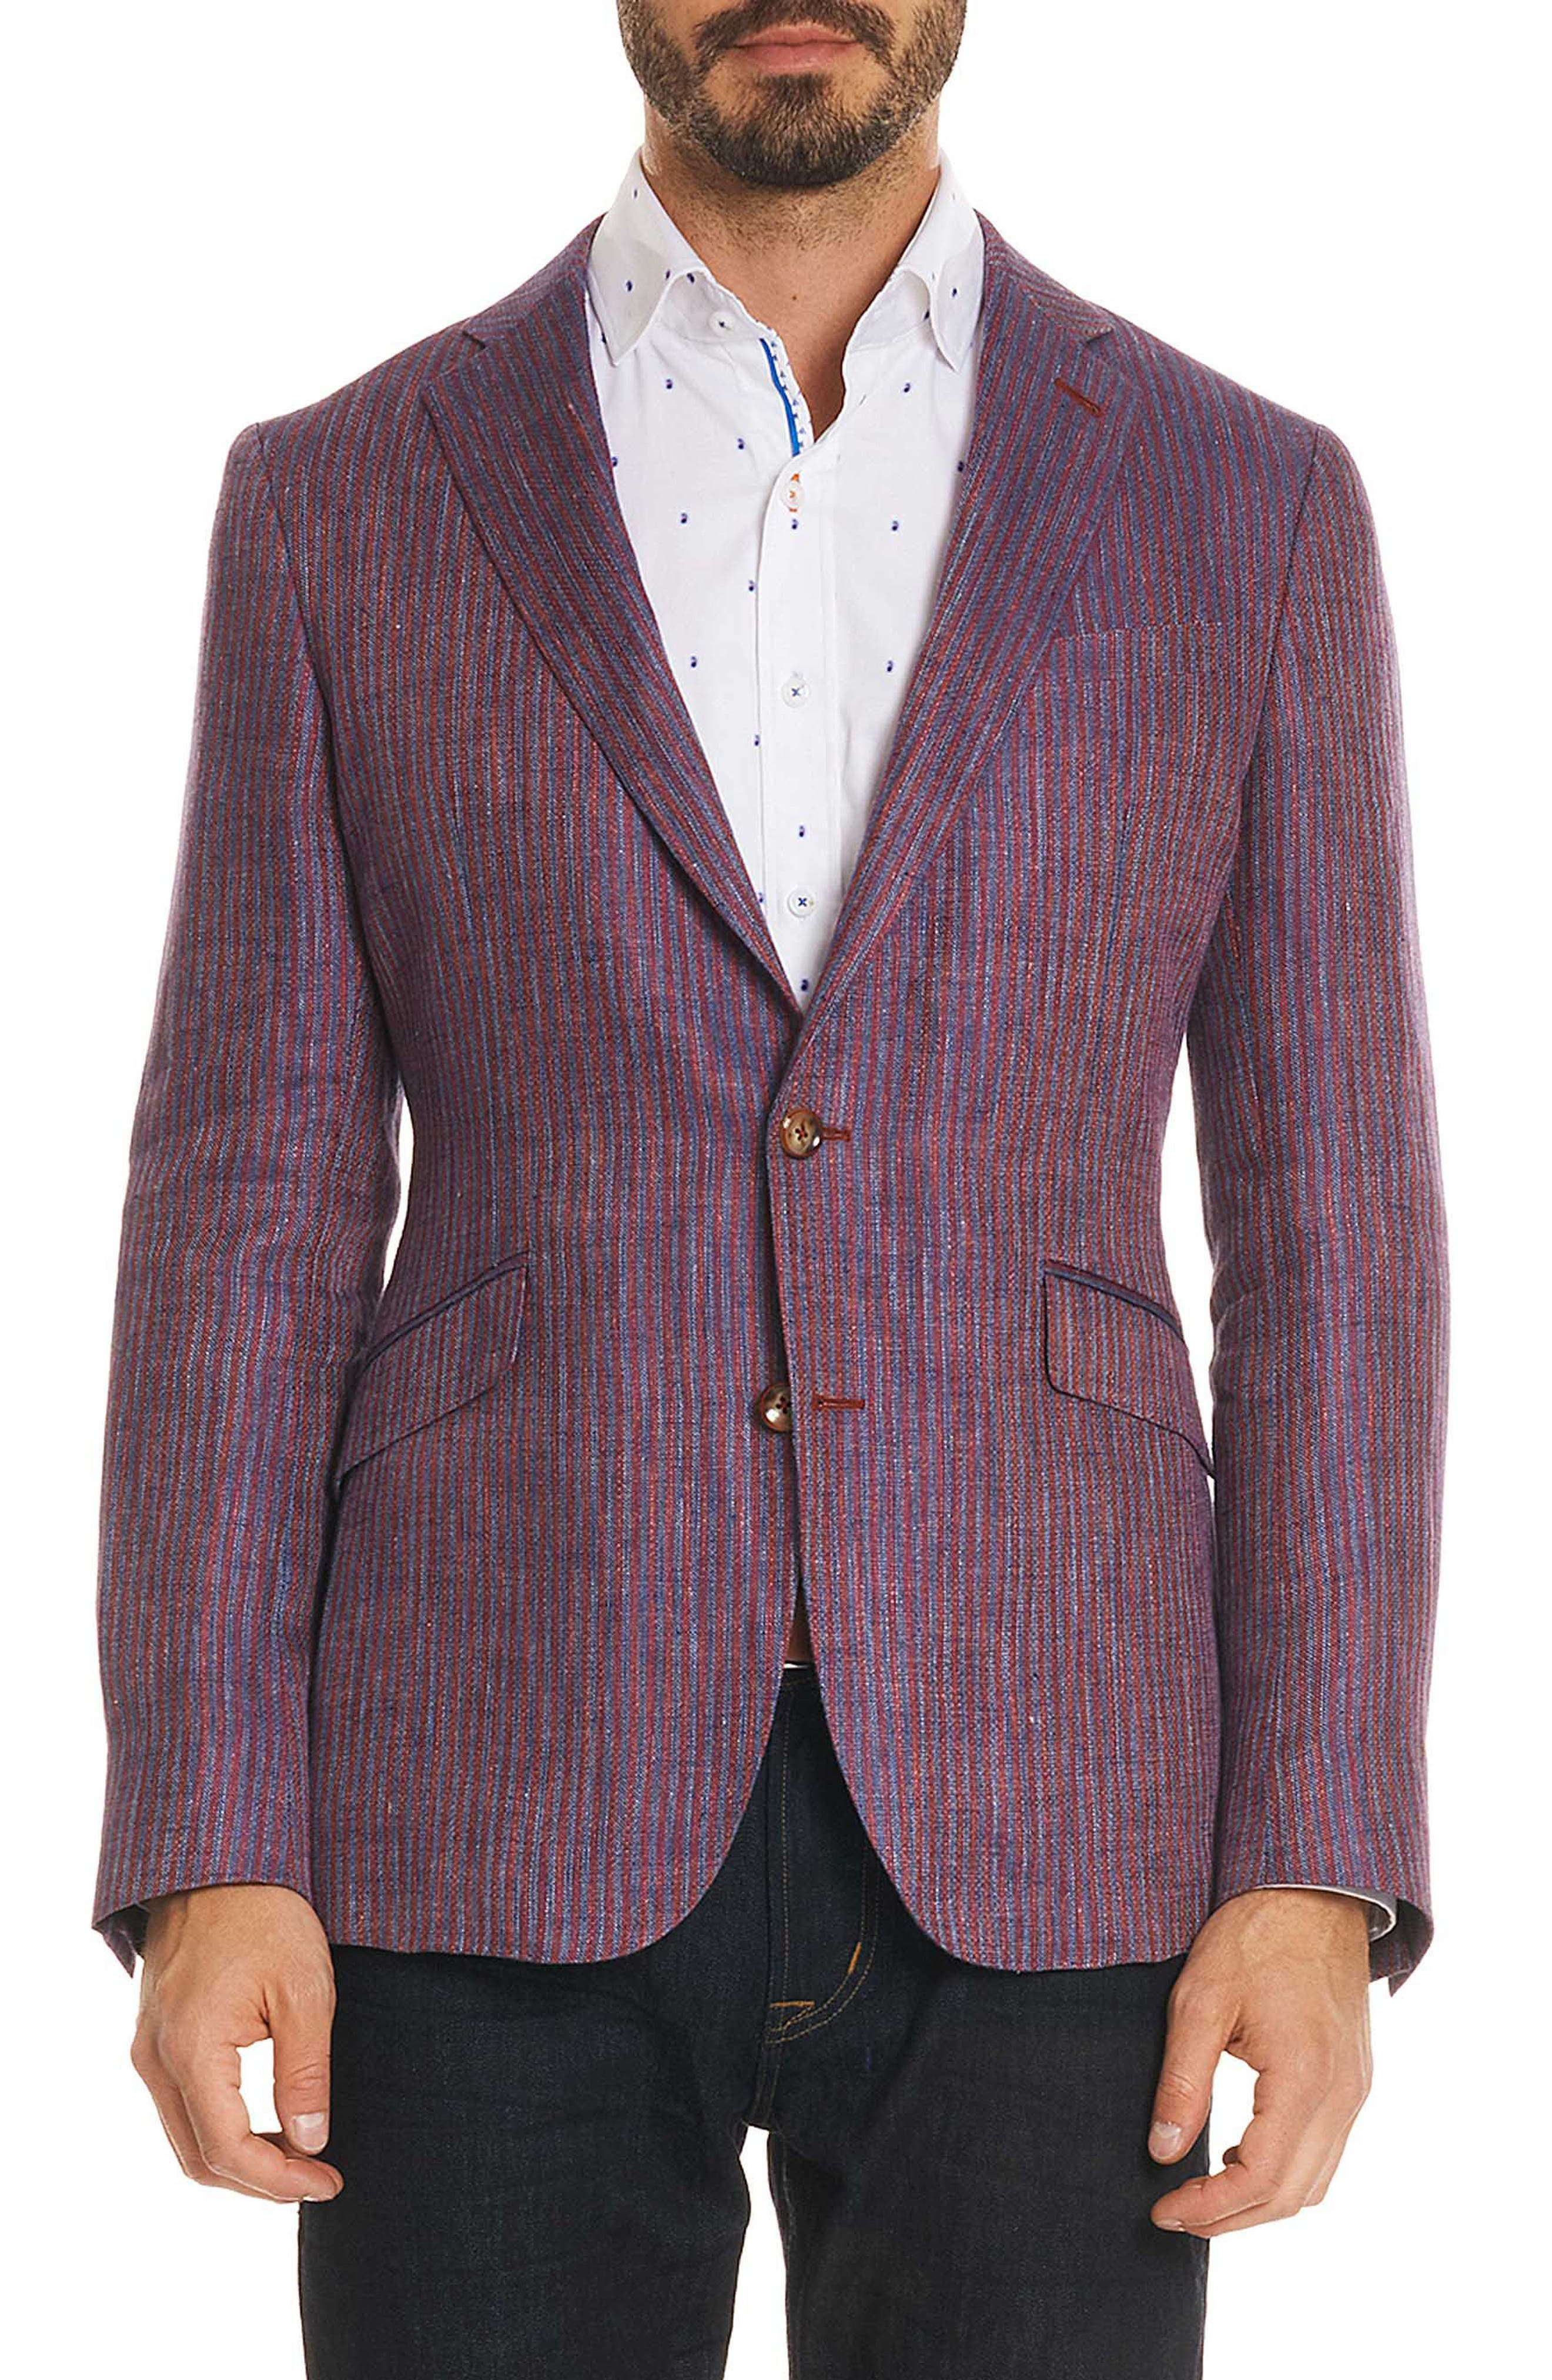 Corbett Tailored Fit Stripe Linen Sport Coat,                             Main thumbnail 1, color,                             Berry